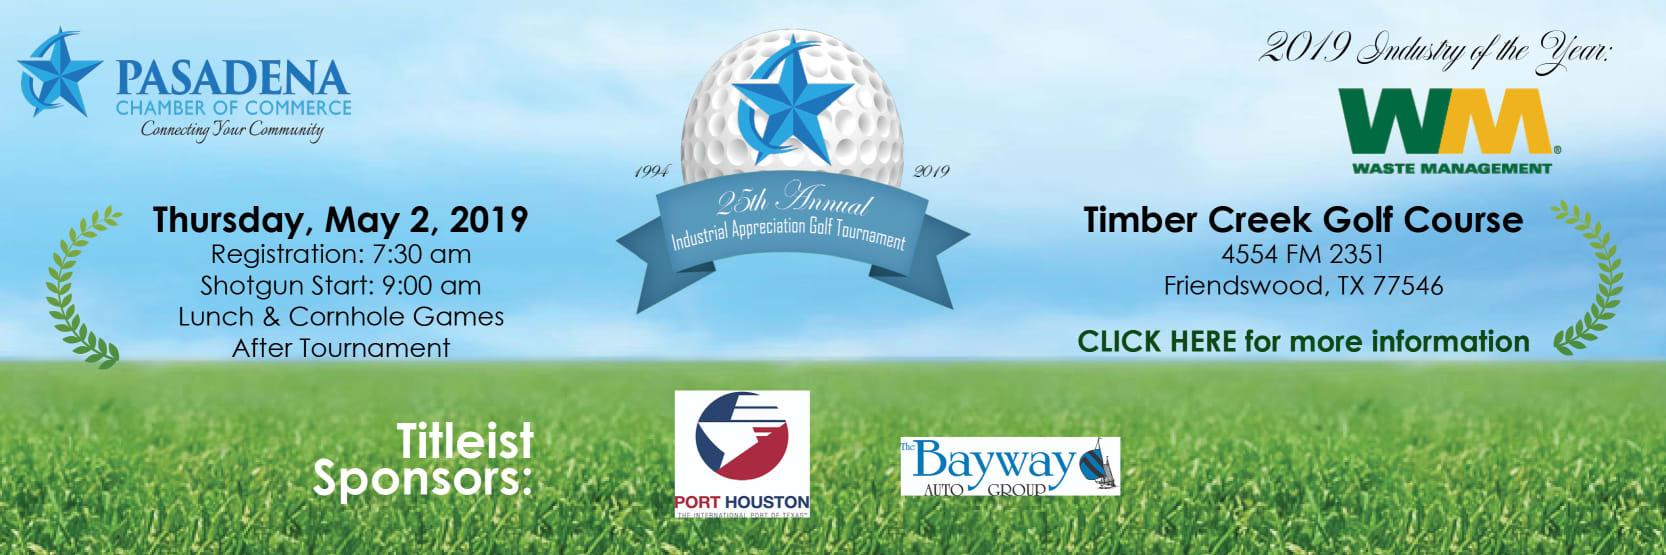 Golf-Web-Banner-w1666.jpg